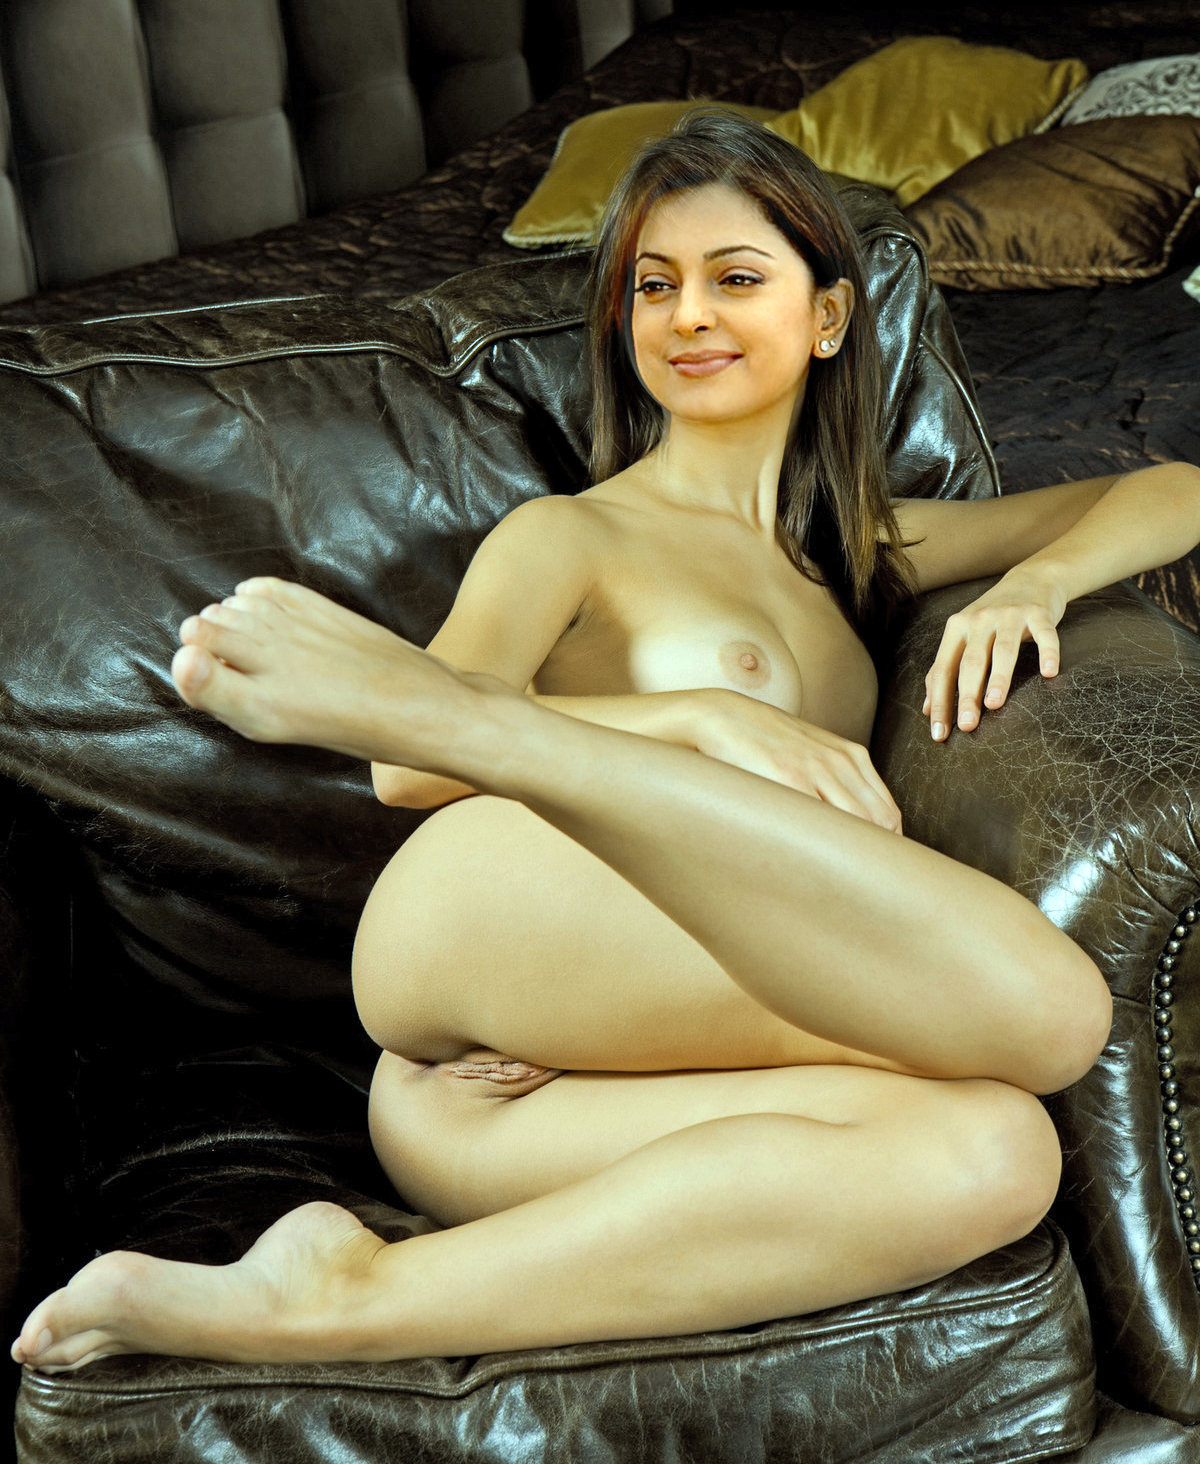 Rosario vampire shemale porn pics exploited porn star